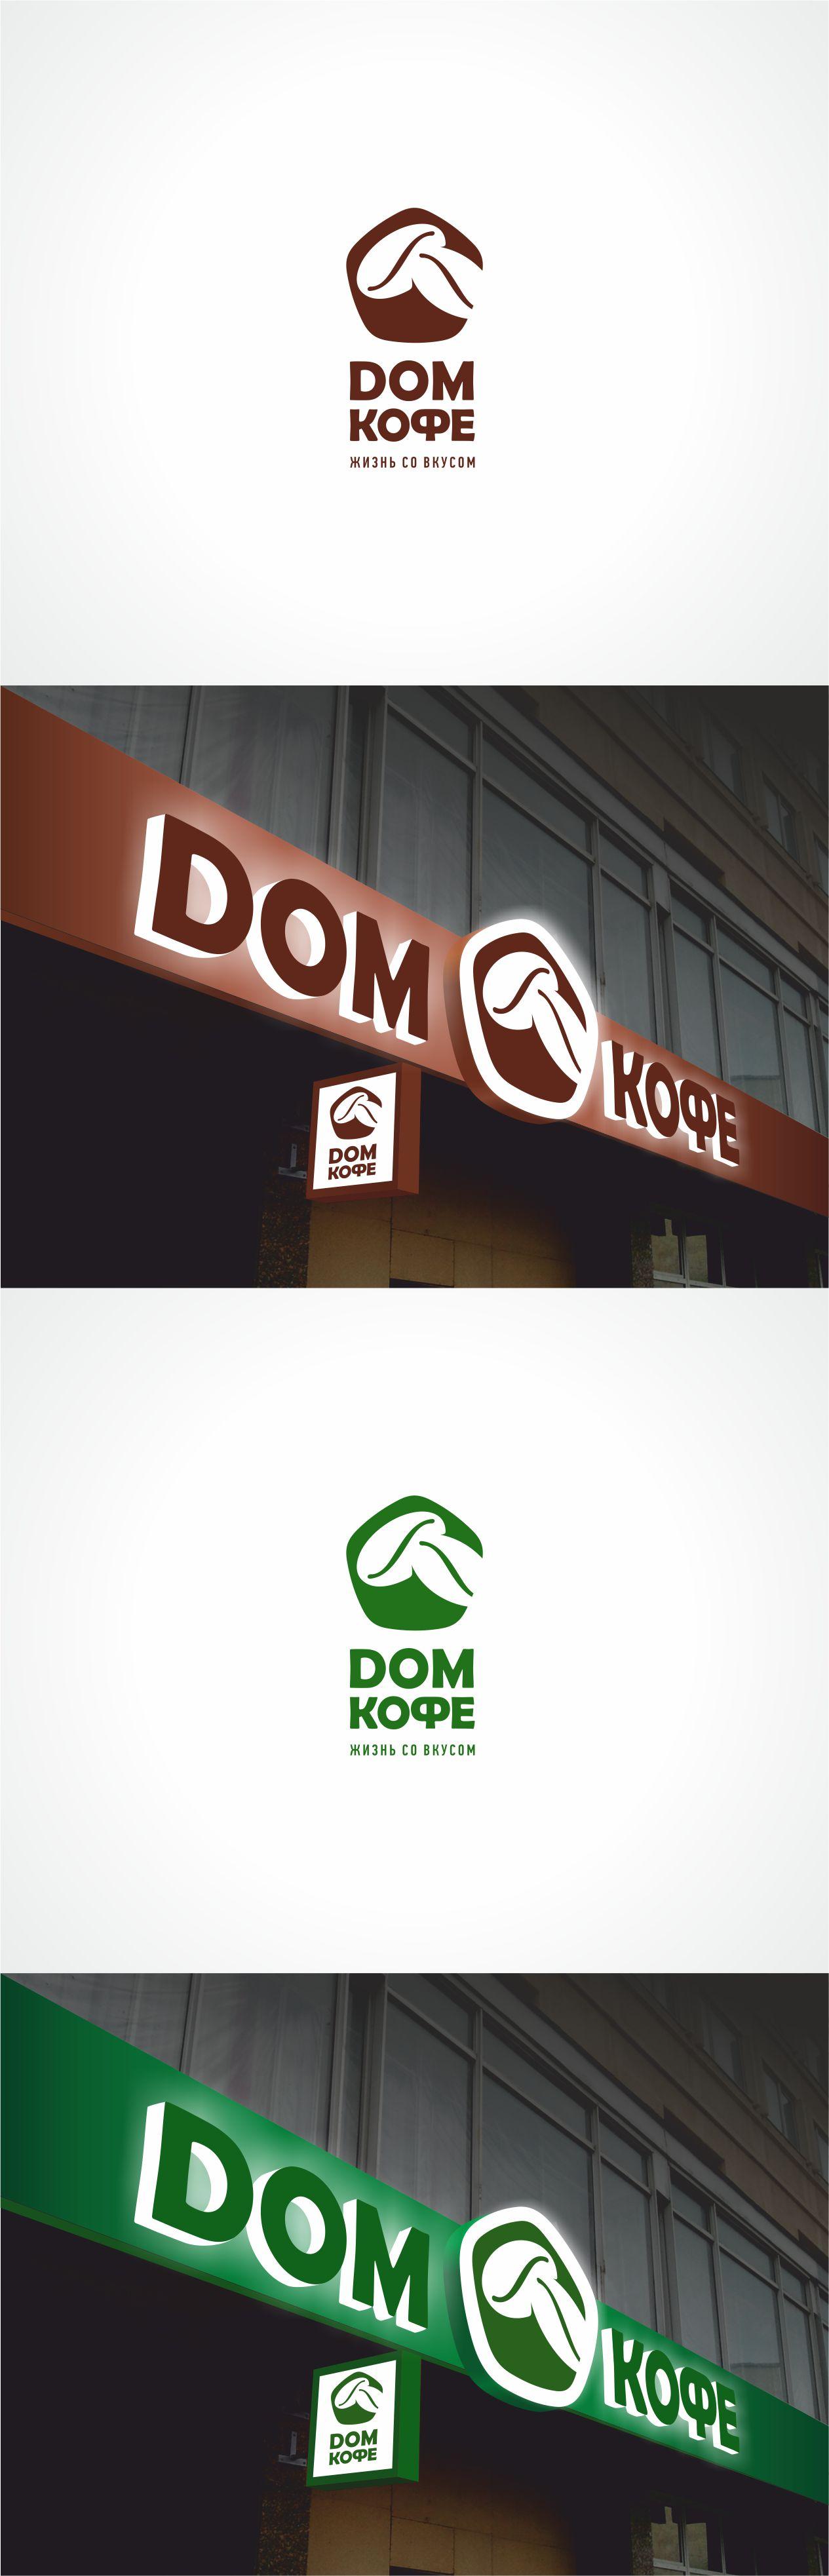 Редизайн логотипа фото f_3665334052bab52c.jpg